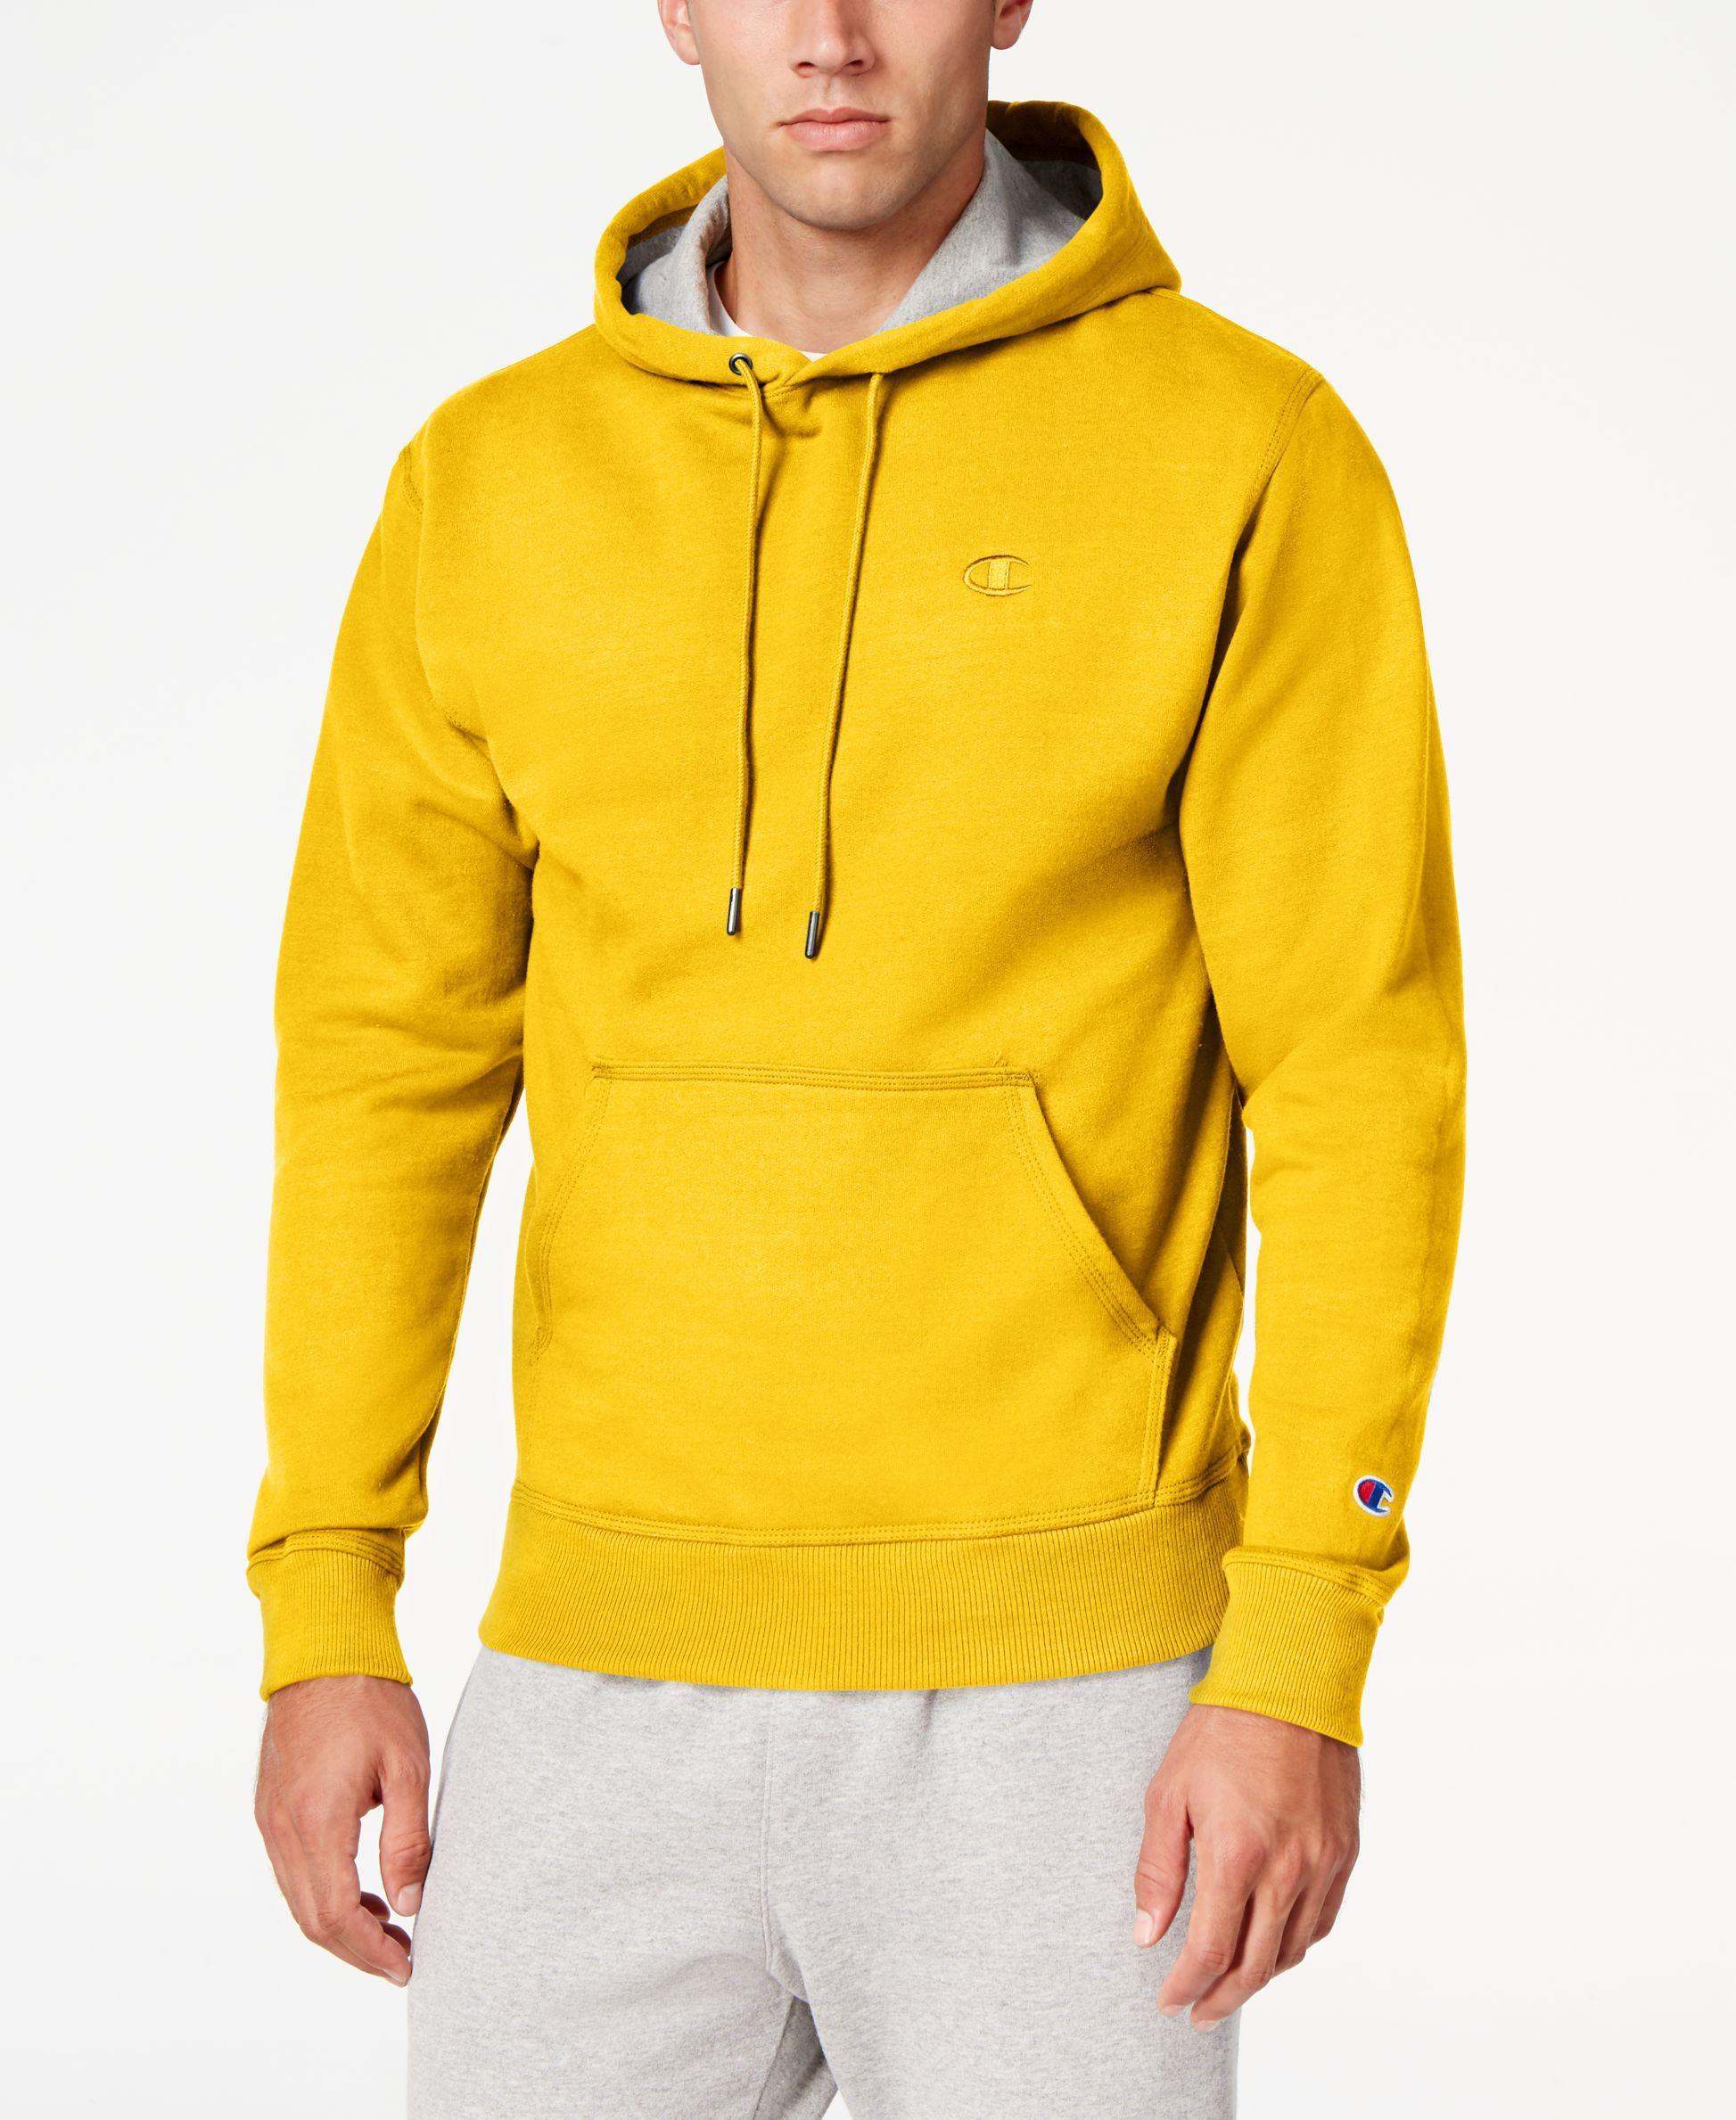 Champion Men S Powerblend Fleece Hoodie Reviews All Activewear Men Macy S Hoodie Outfit Men Fleece Hoodie Yellow Champion Hoodie [ 2378 x 1947 Pixel ]